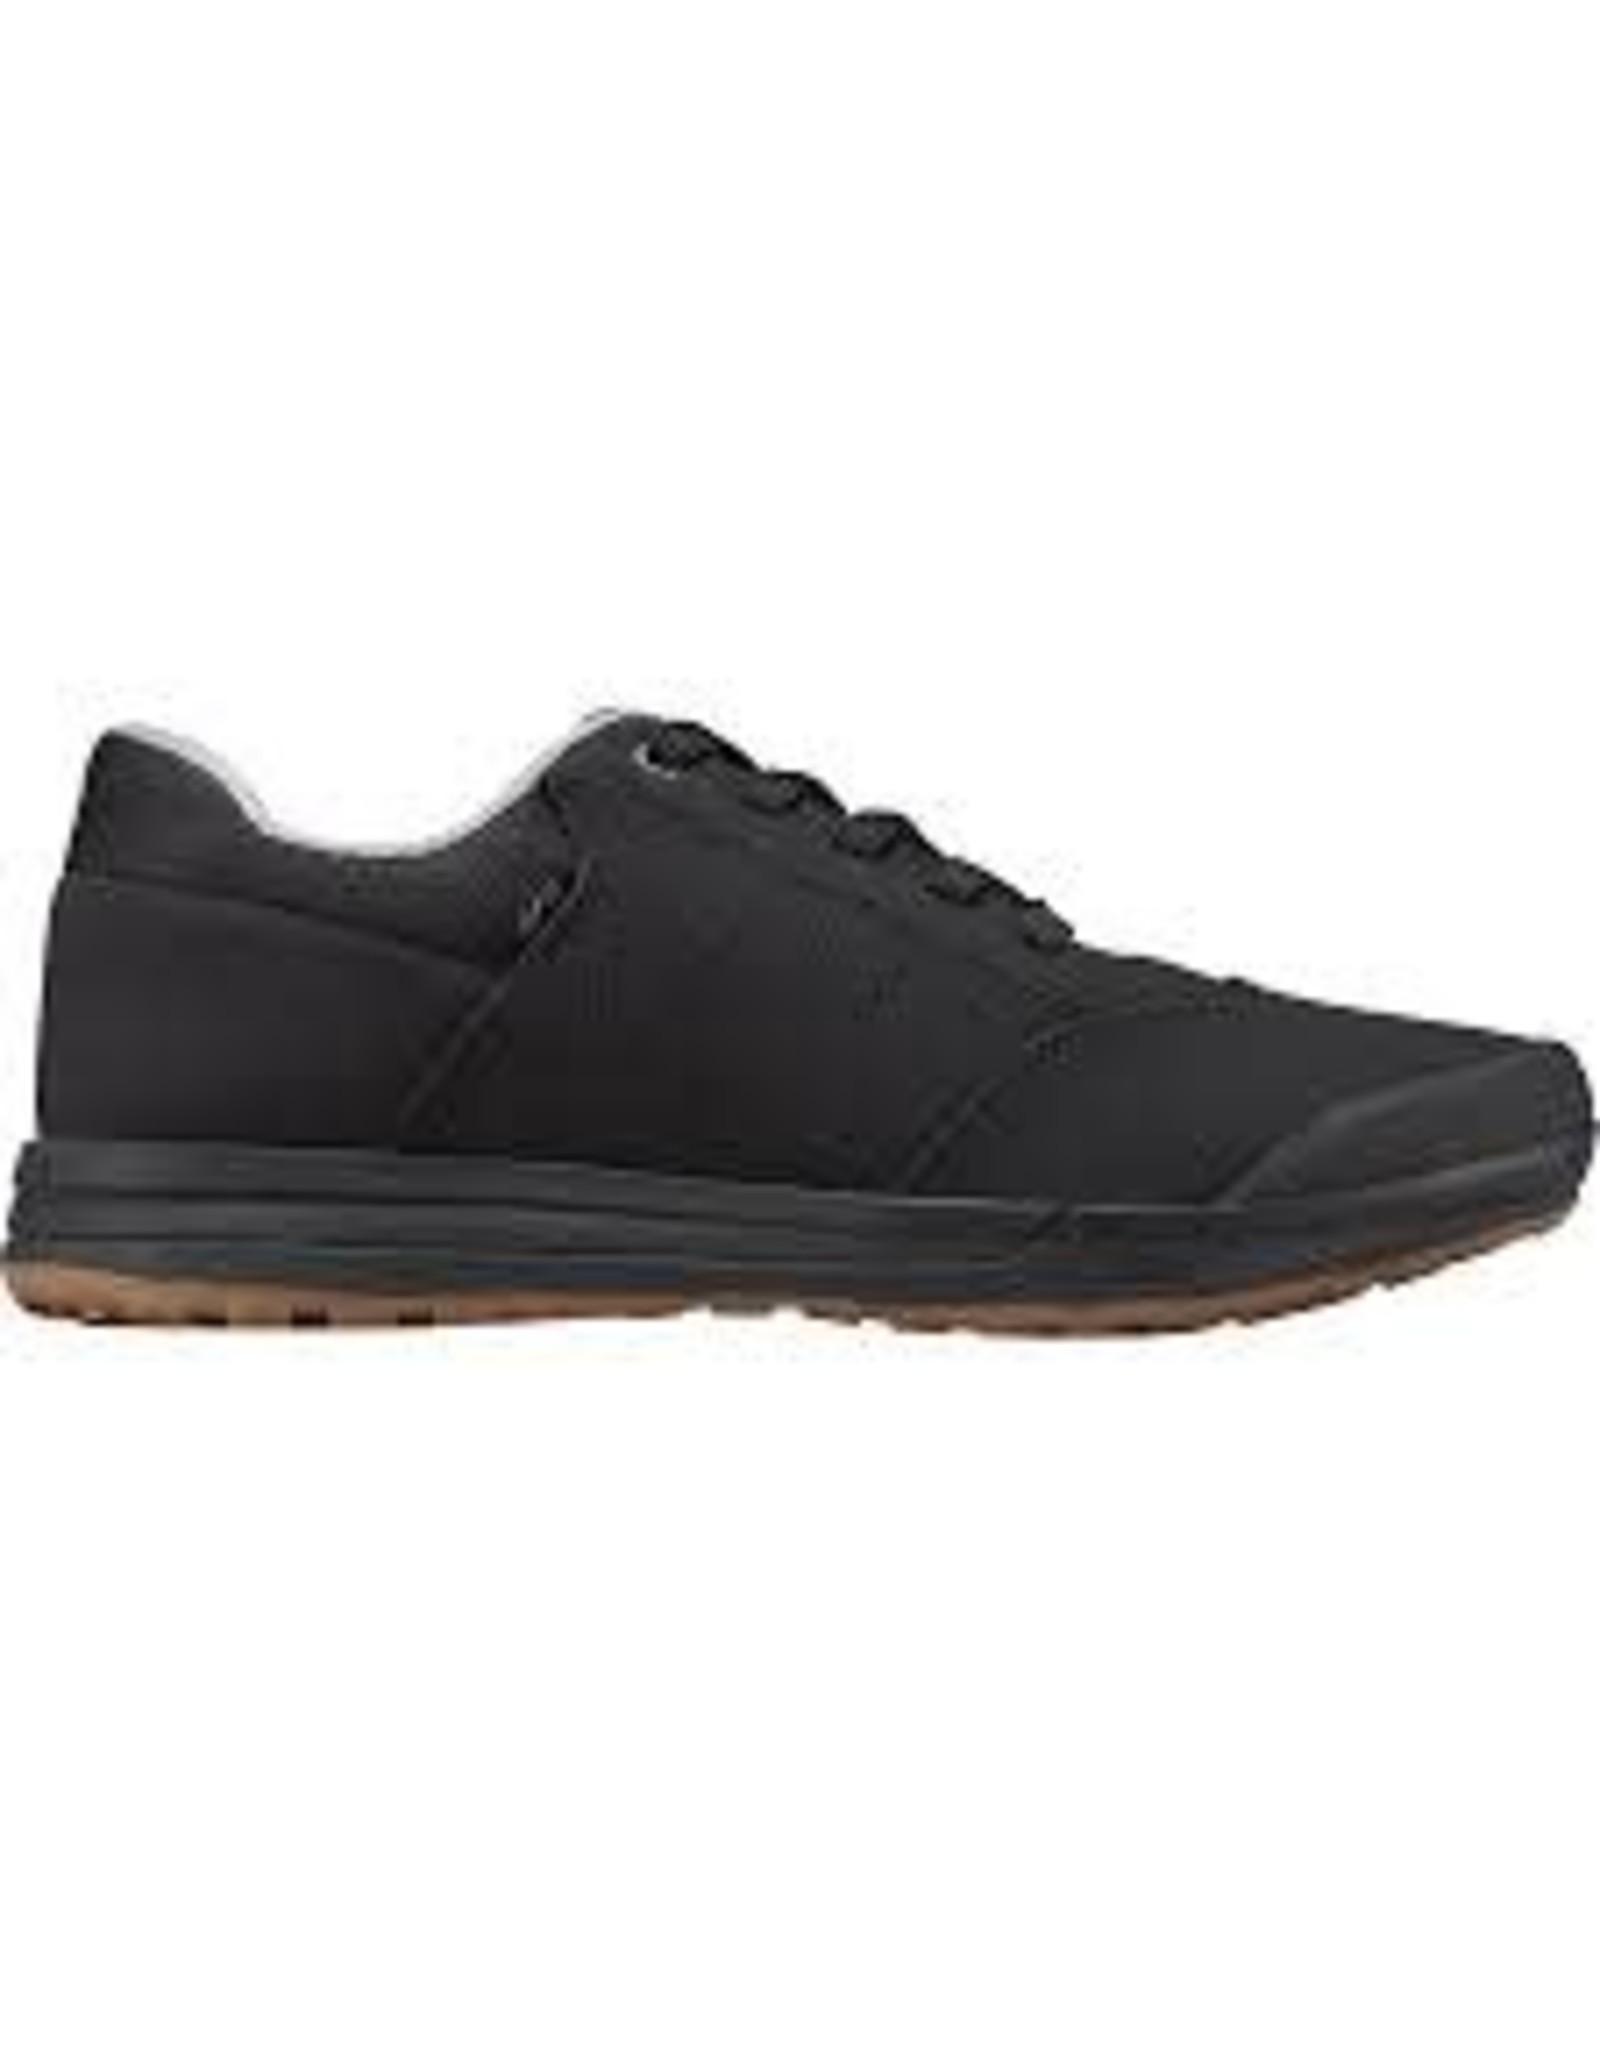 Specialized Shoe Spec 2FO Roost Flat Blk 45